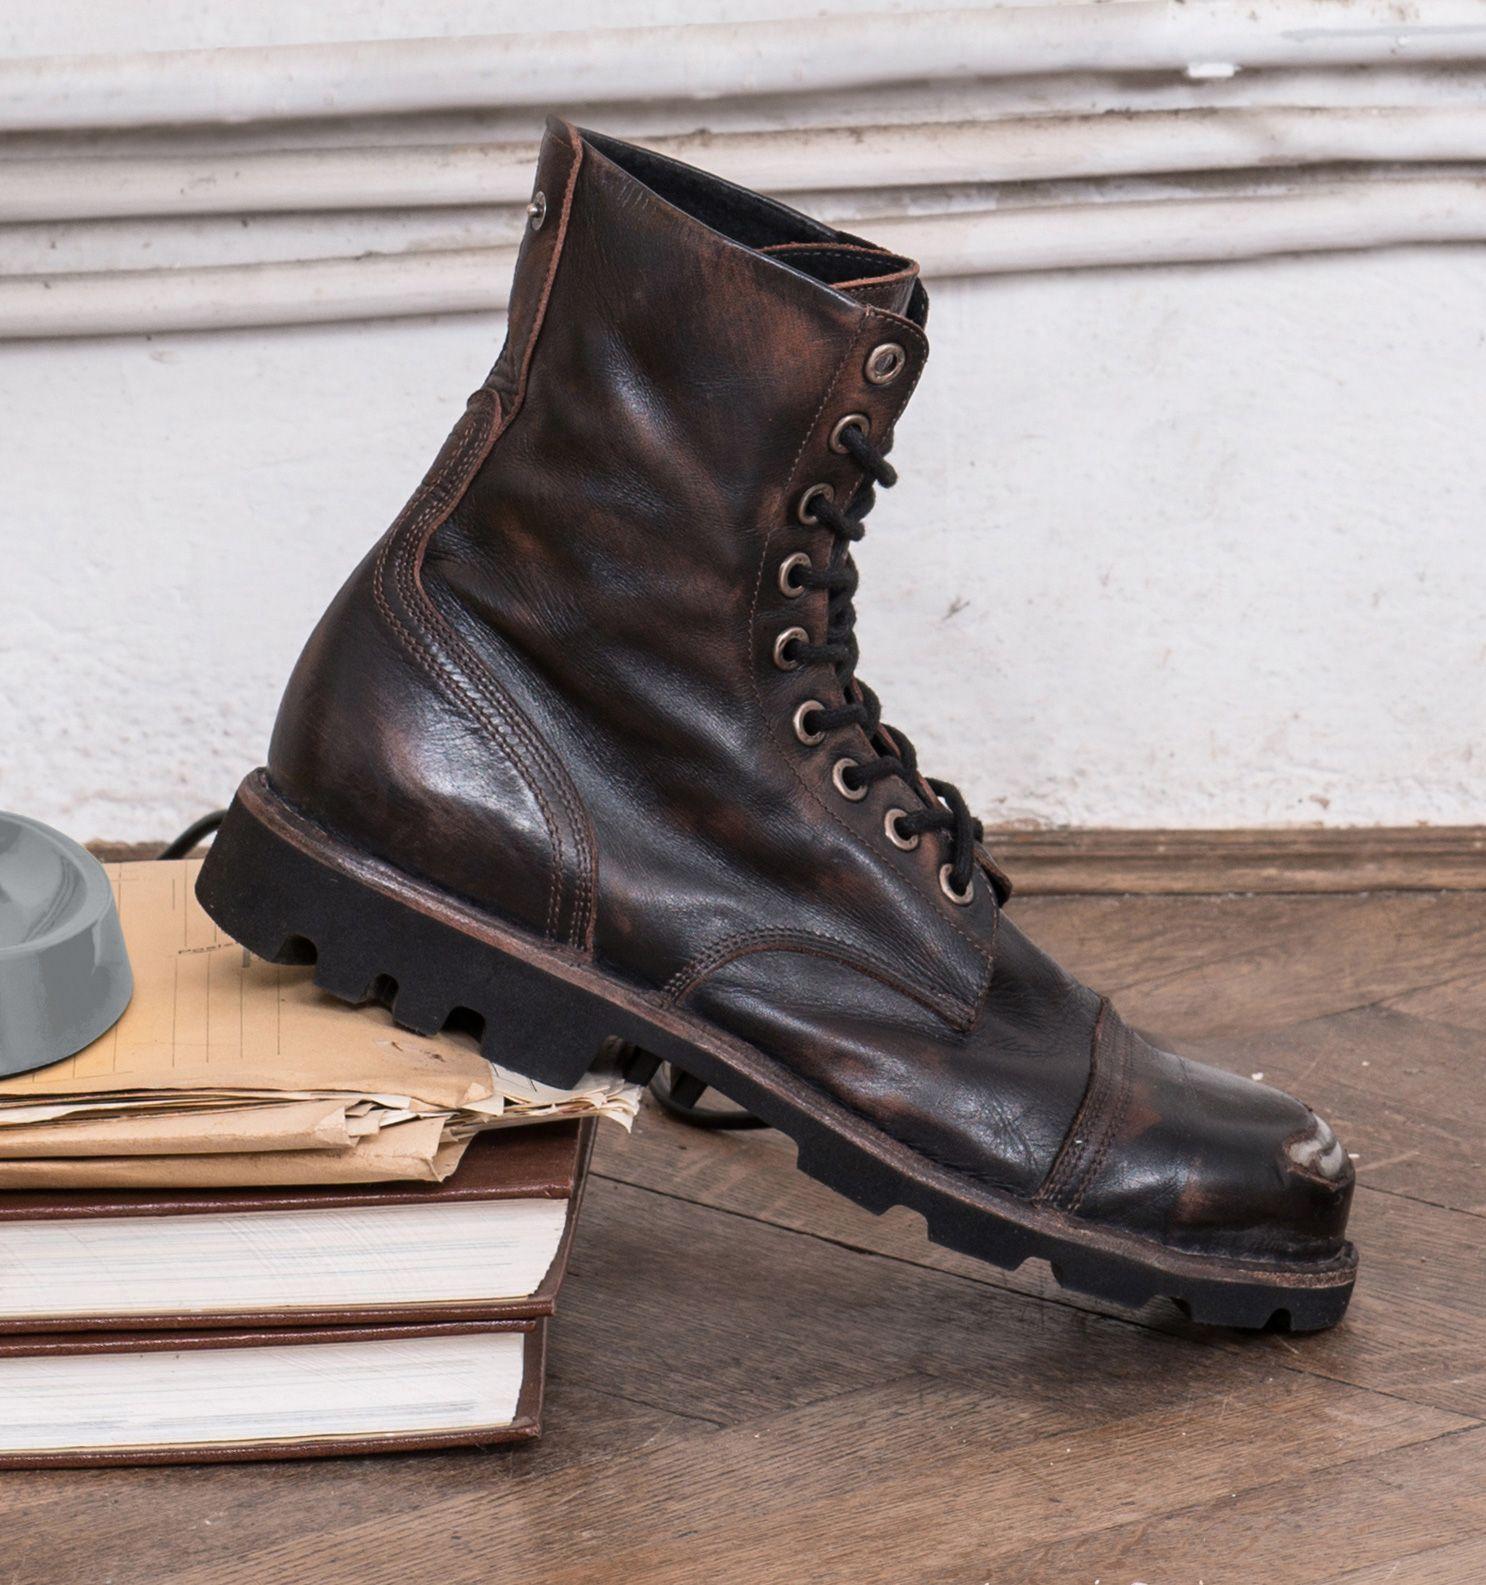 a90dd139430 Diesel Men's Shoes SS15 Preview - steel boots men style | dress code ...